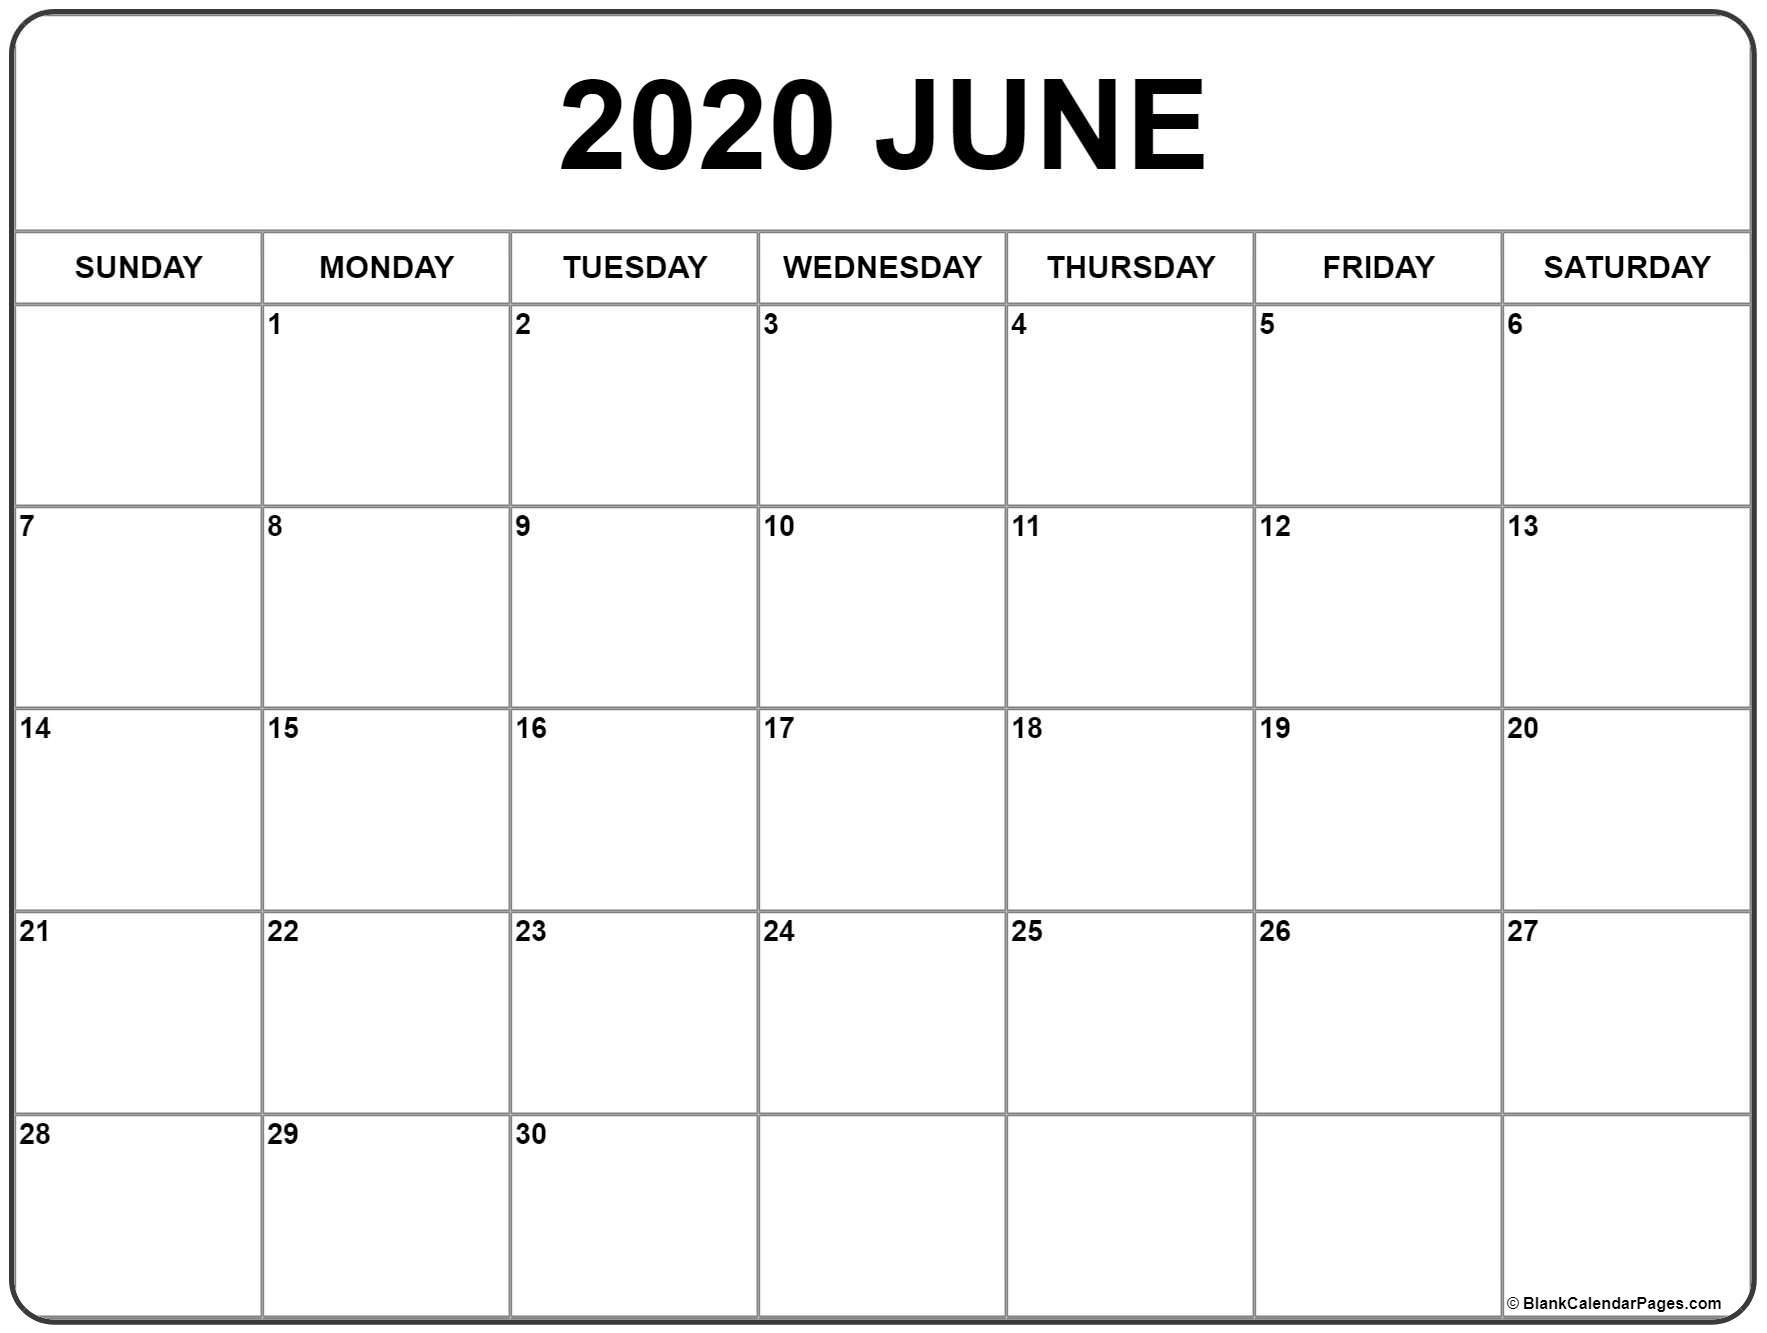 June 2020 Calendar | Free Printable Monthly Calendars  Full Size Printable Monthly Calendars